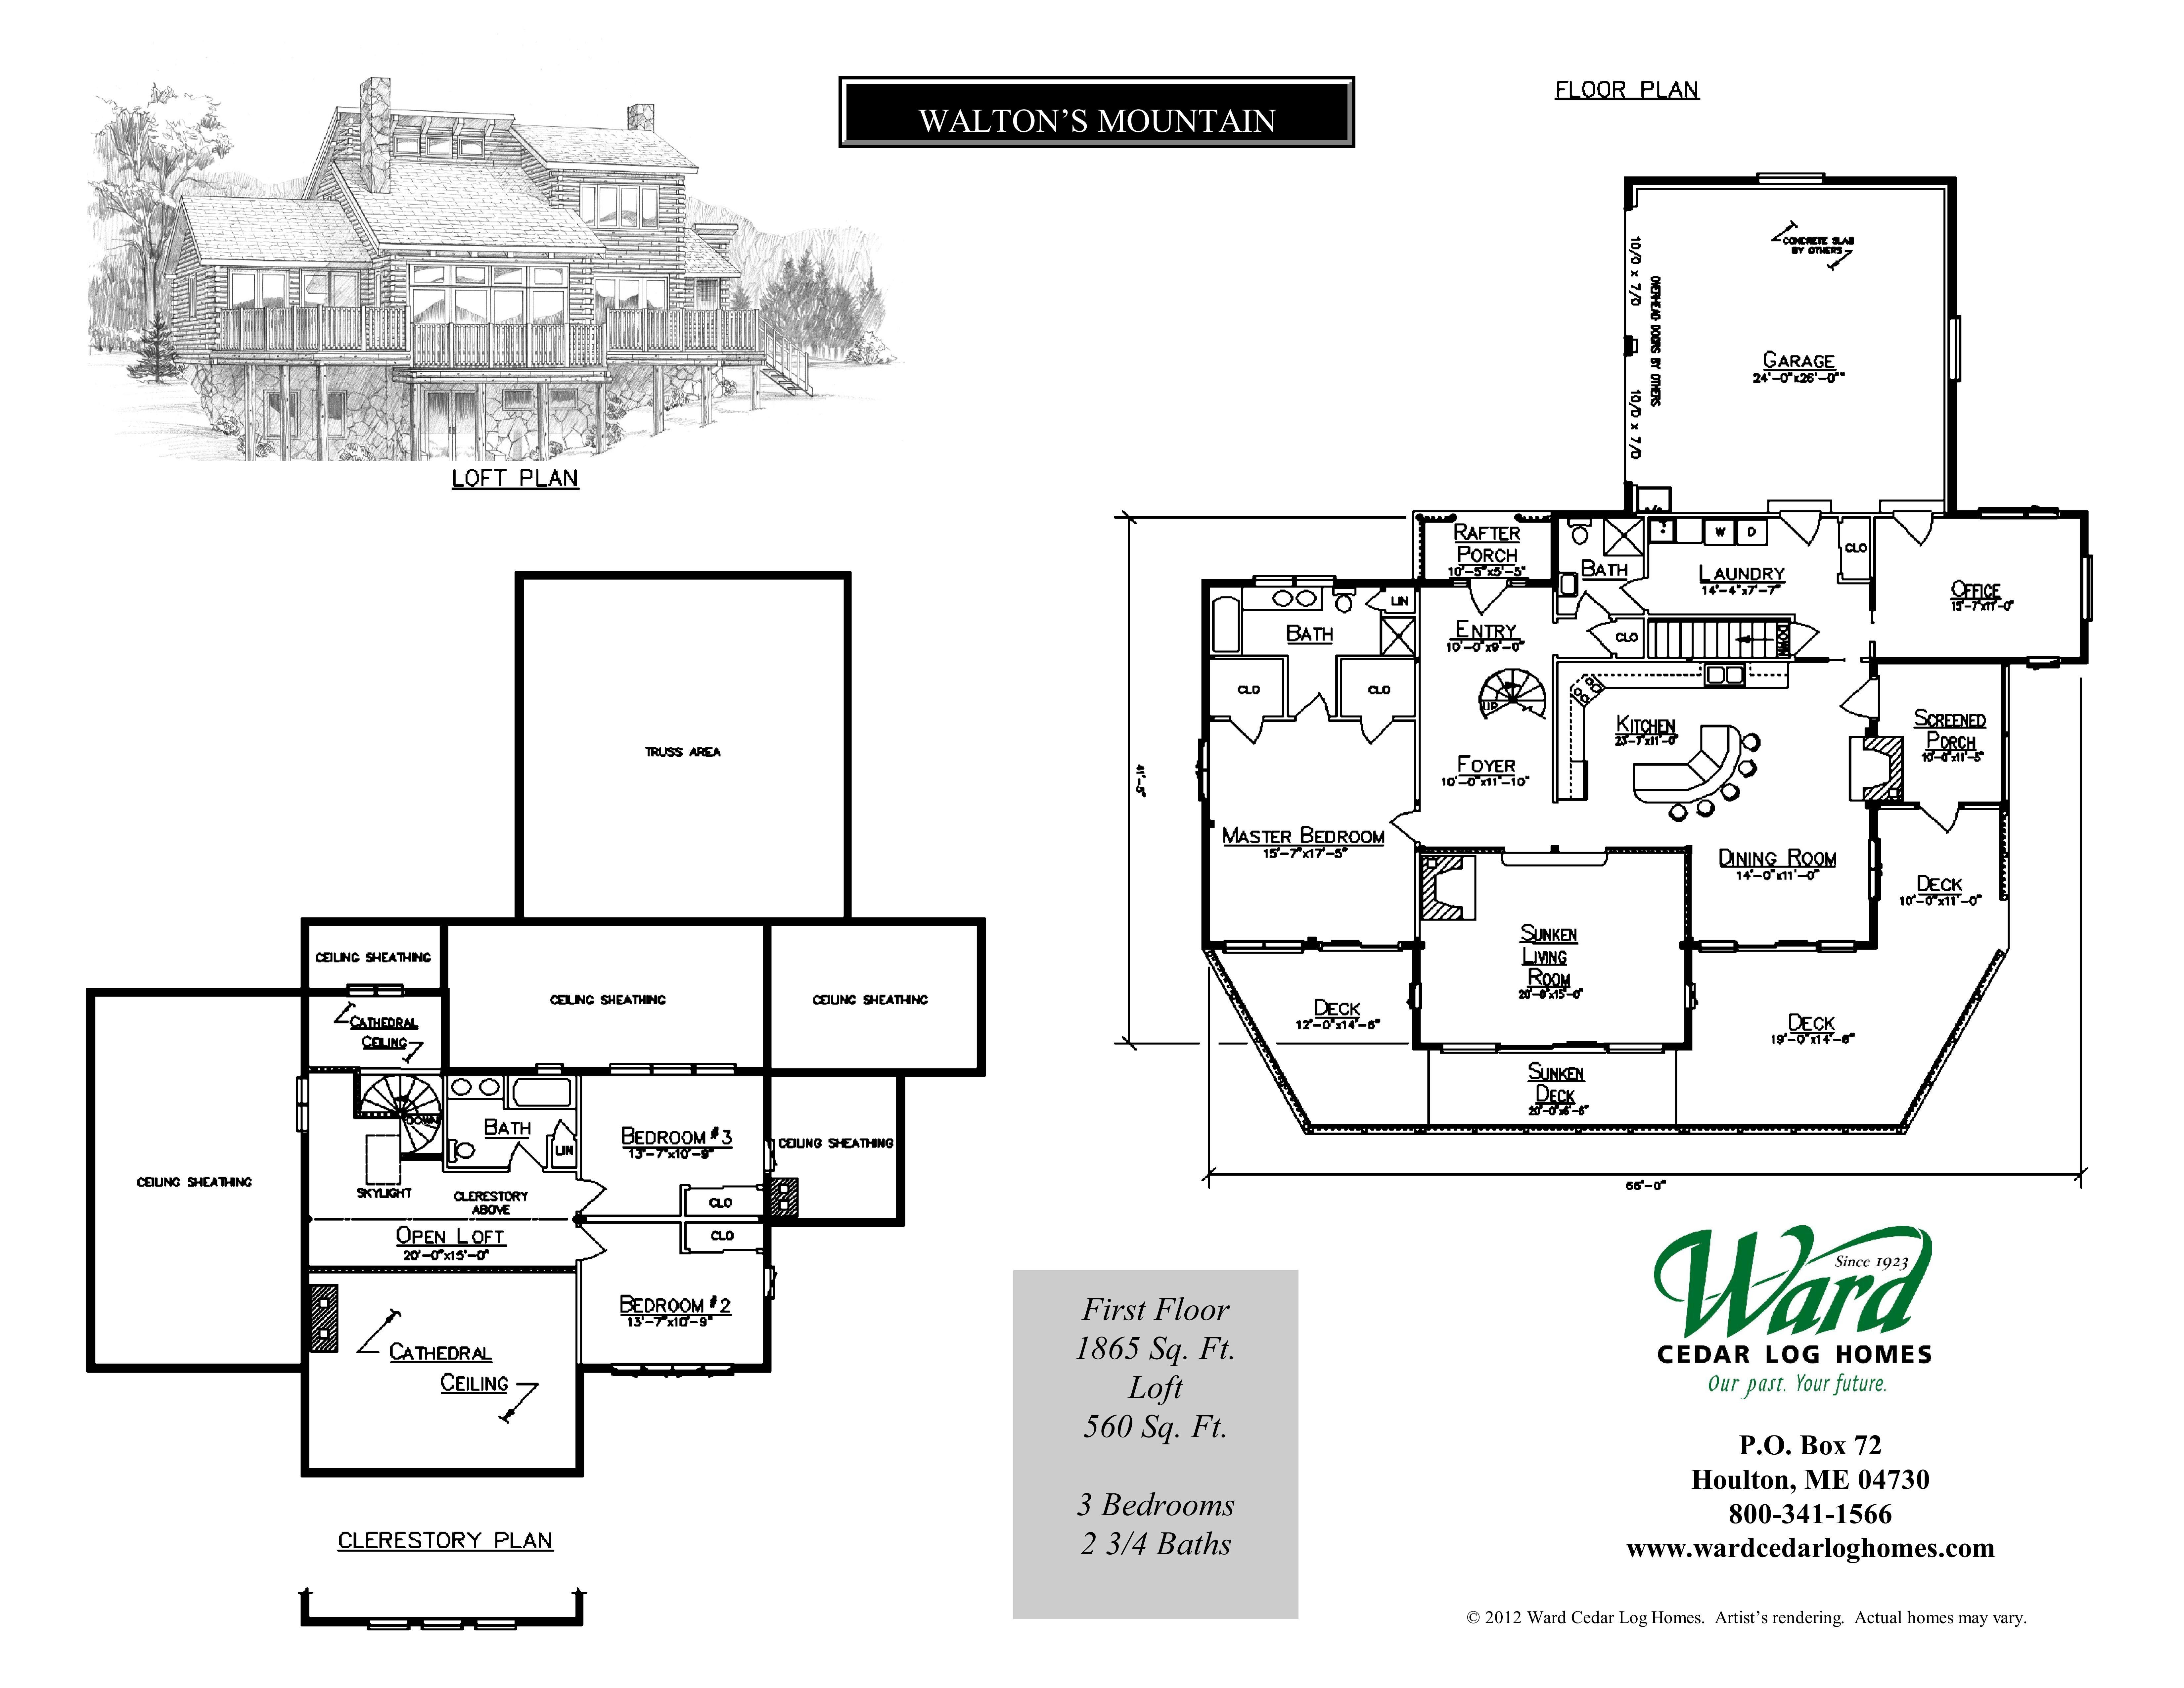 The Walton's Mountain Floor Plan